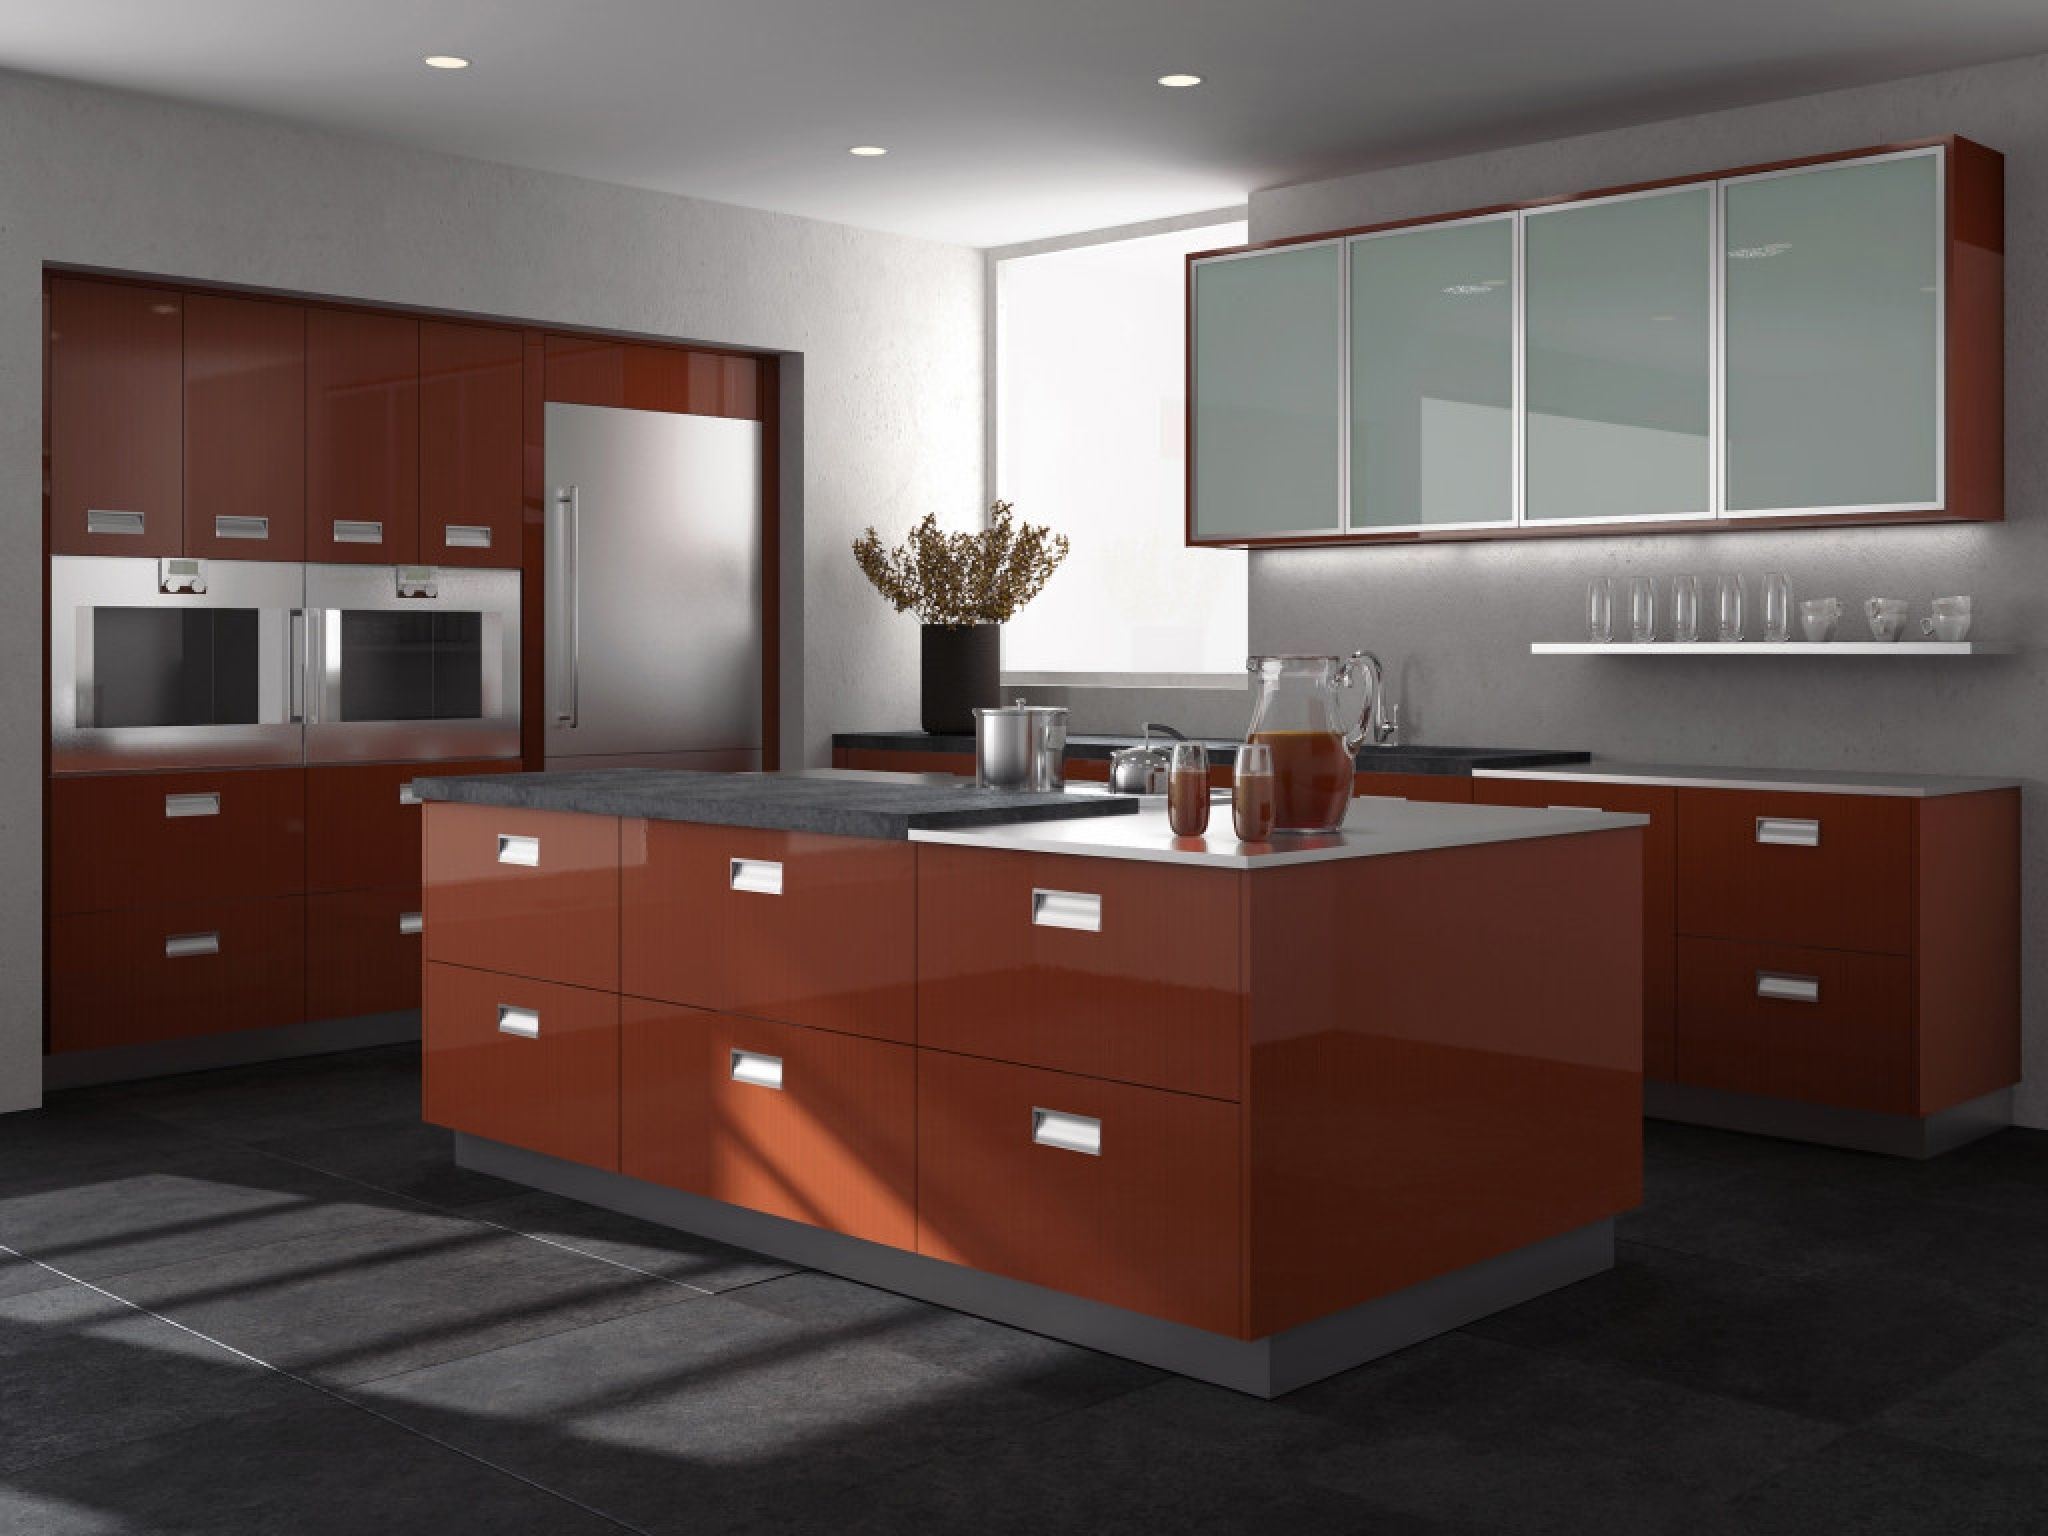 Best Kitchen Gallery: European Style Modern High Gloss Kitchen Cabi S Ideas For of European Style Modern High Gloss Kitchen Cabinets on rachelxblog.com